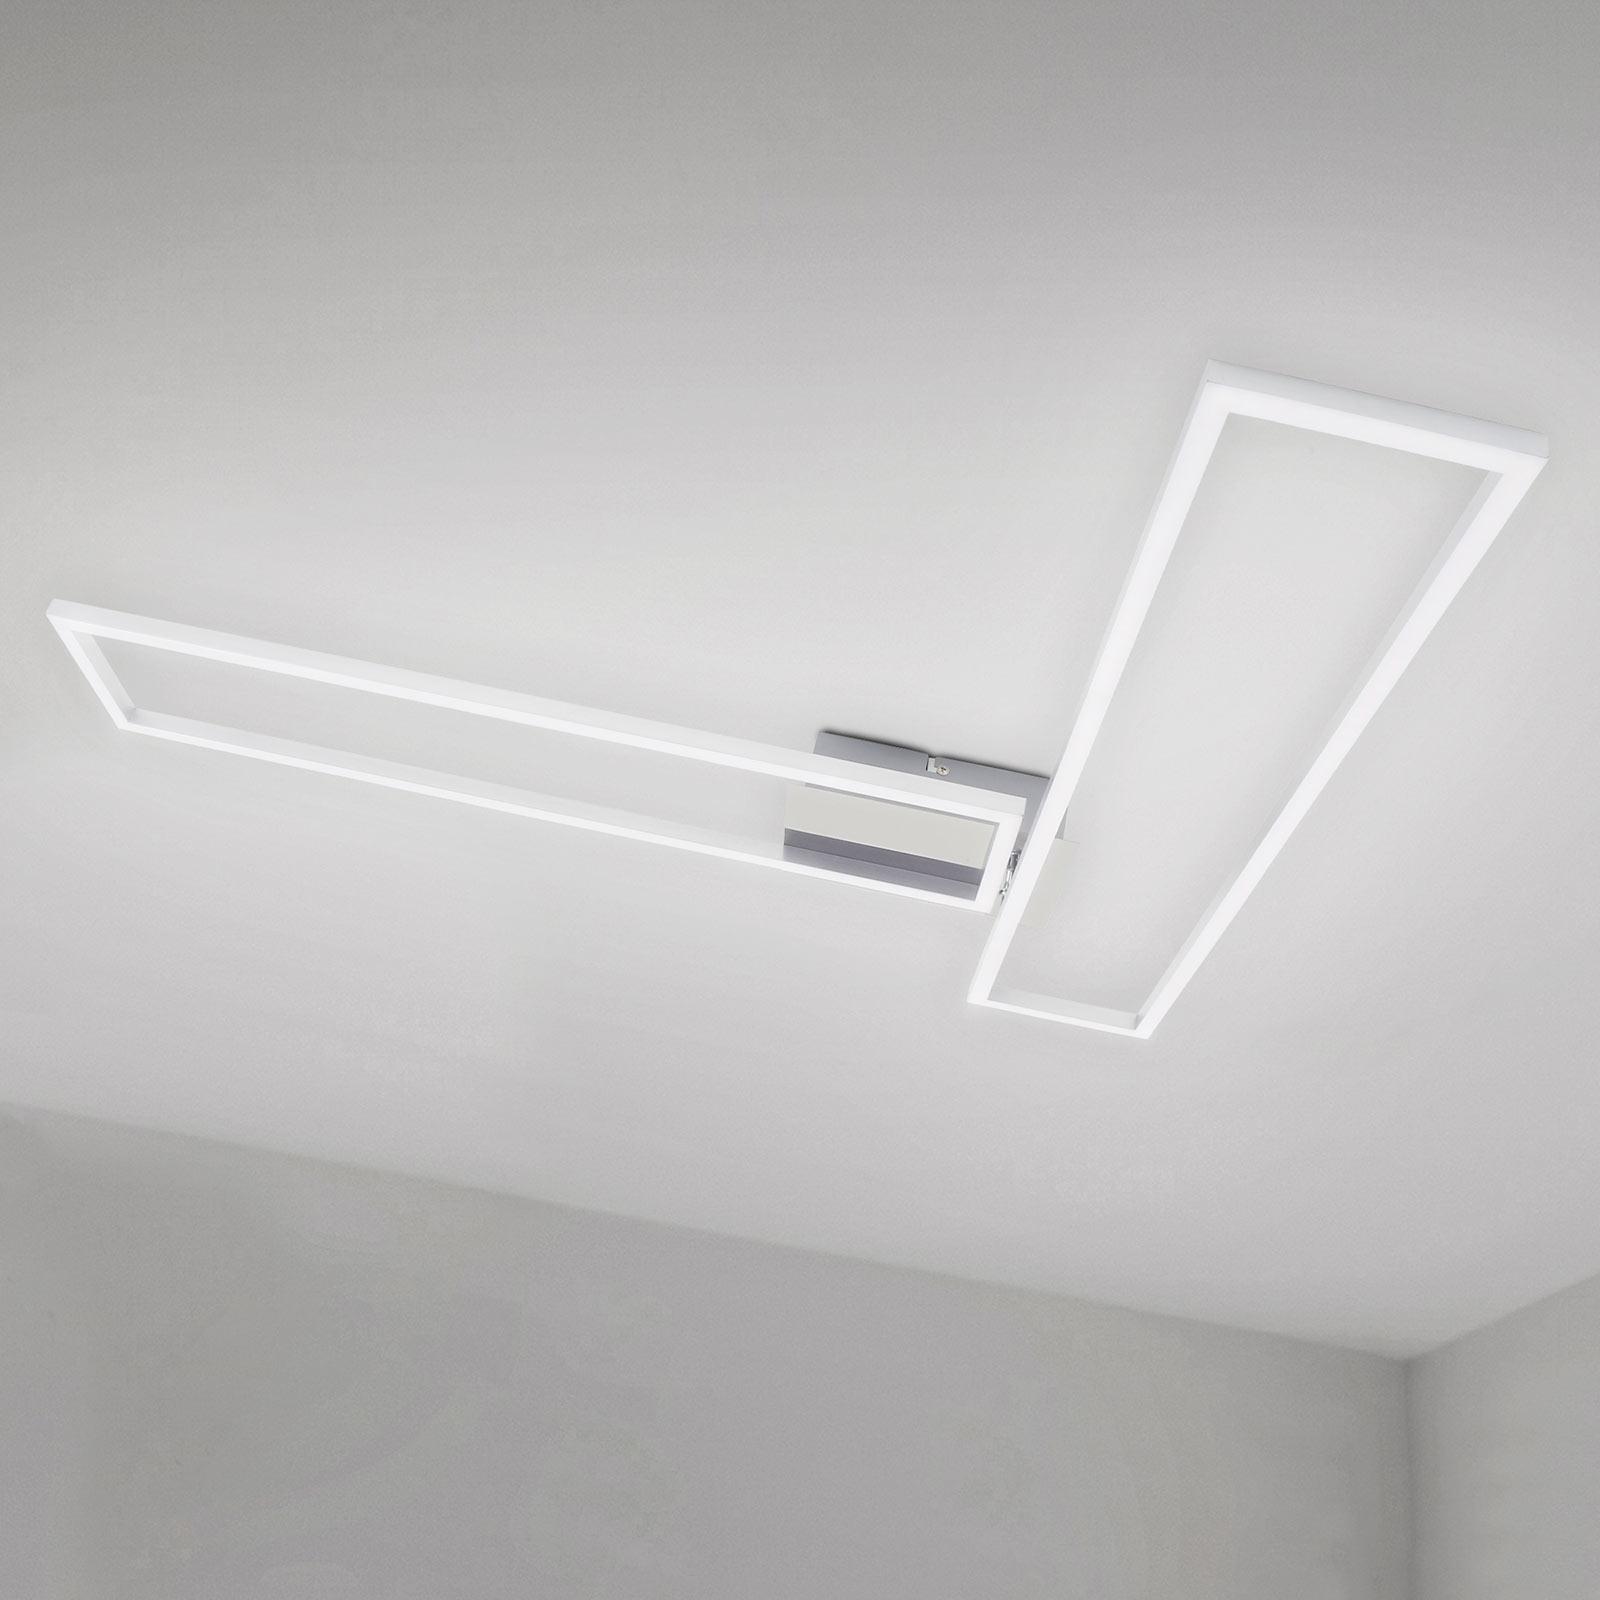 Taklampe Frame WiFi CCT, fjernkontroll, alu